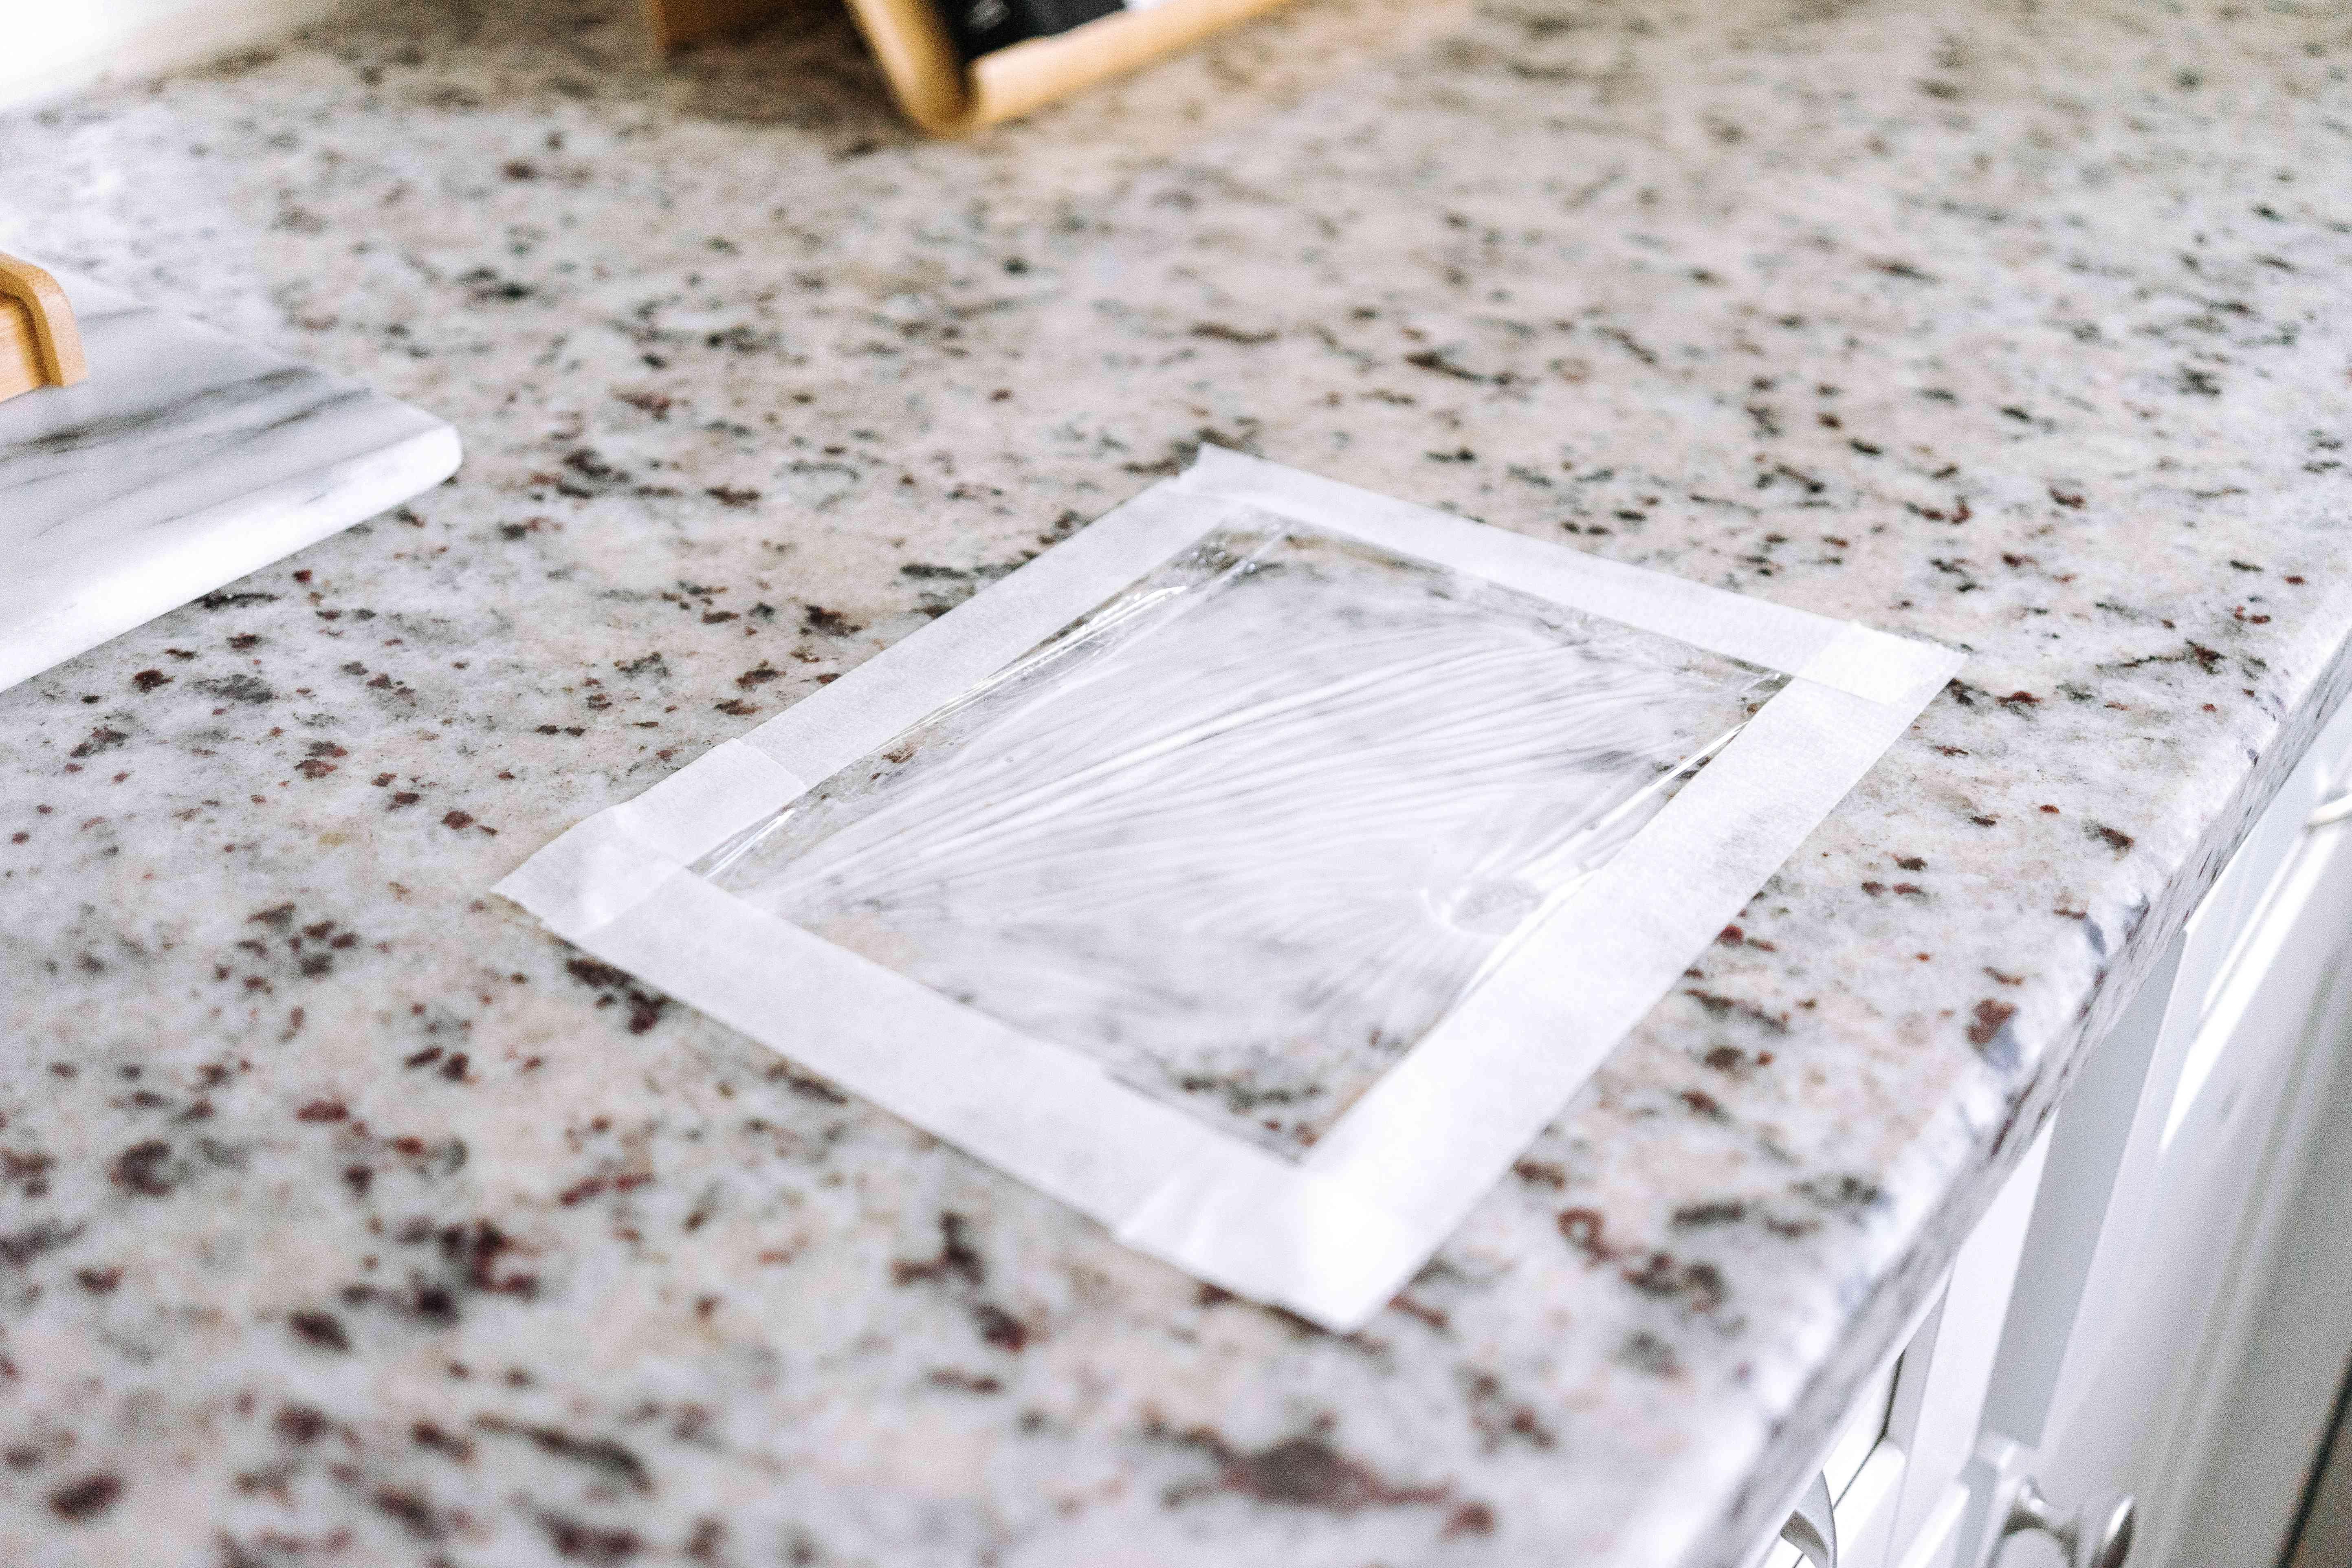 plastic wrap on a granite countertop